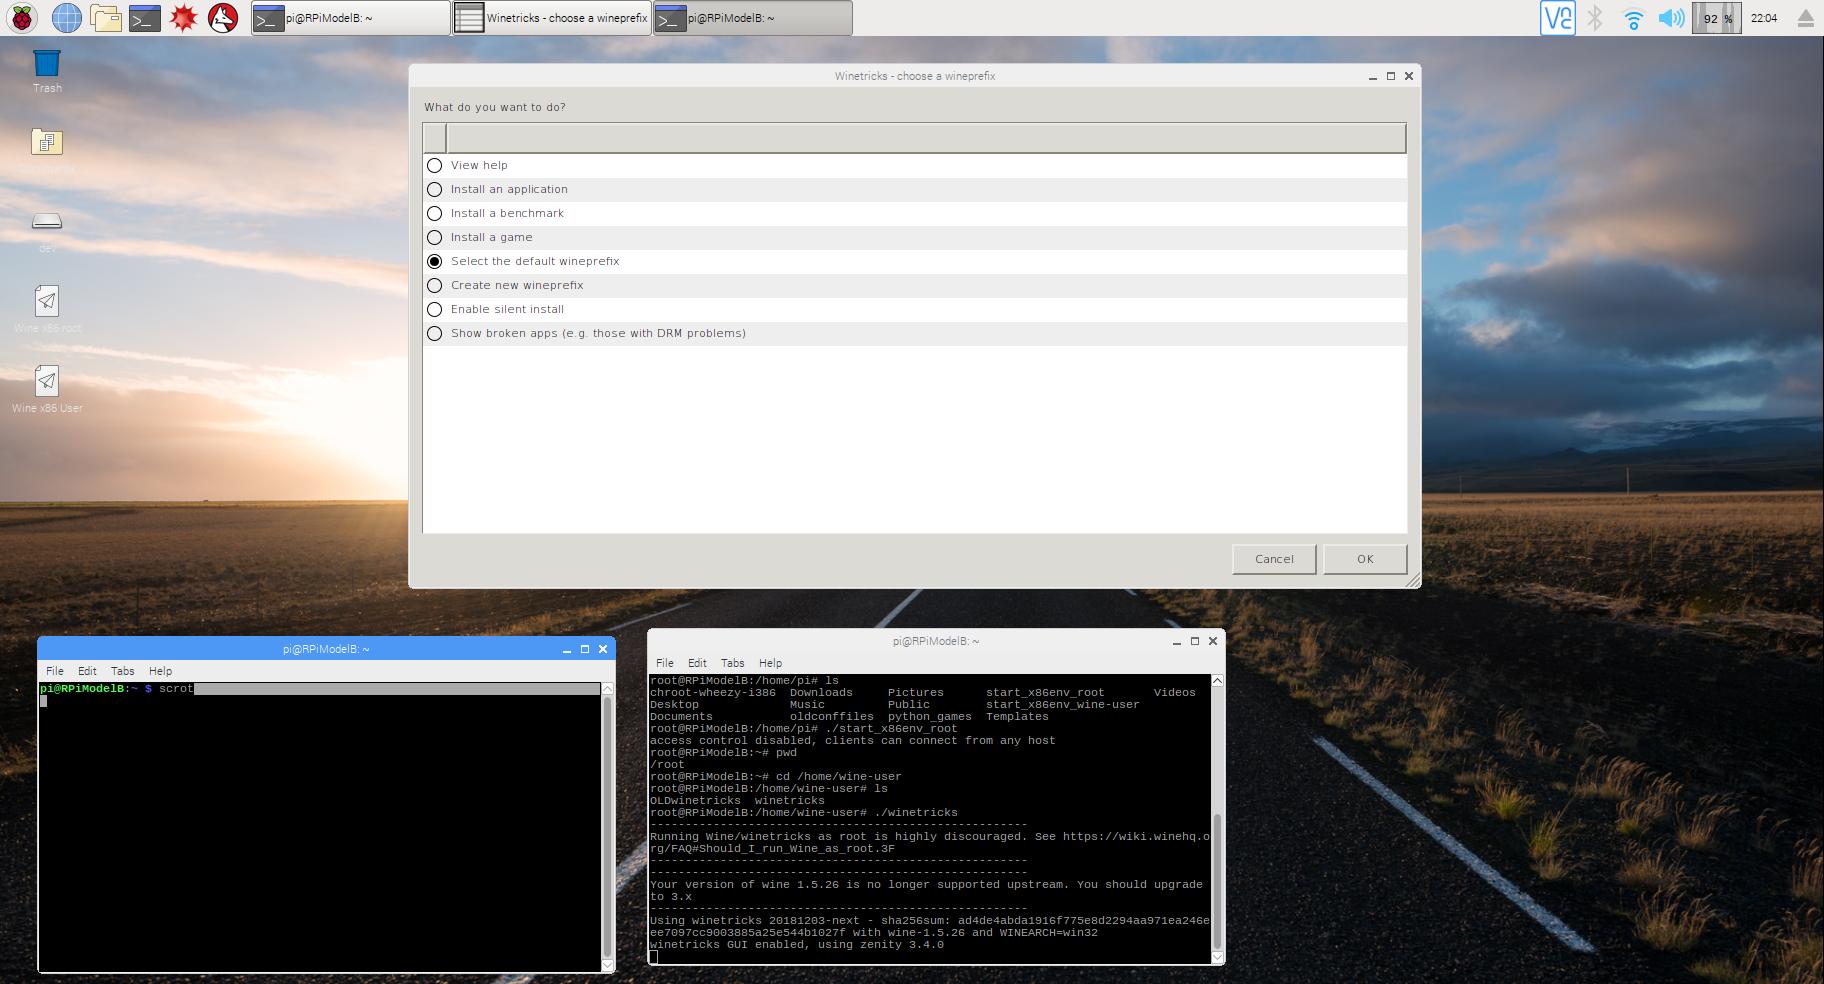 Getting RPi-QEMU-x86-wine Too Run winetricks on a Raspberry Pi